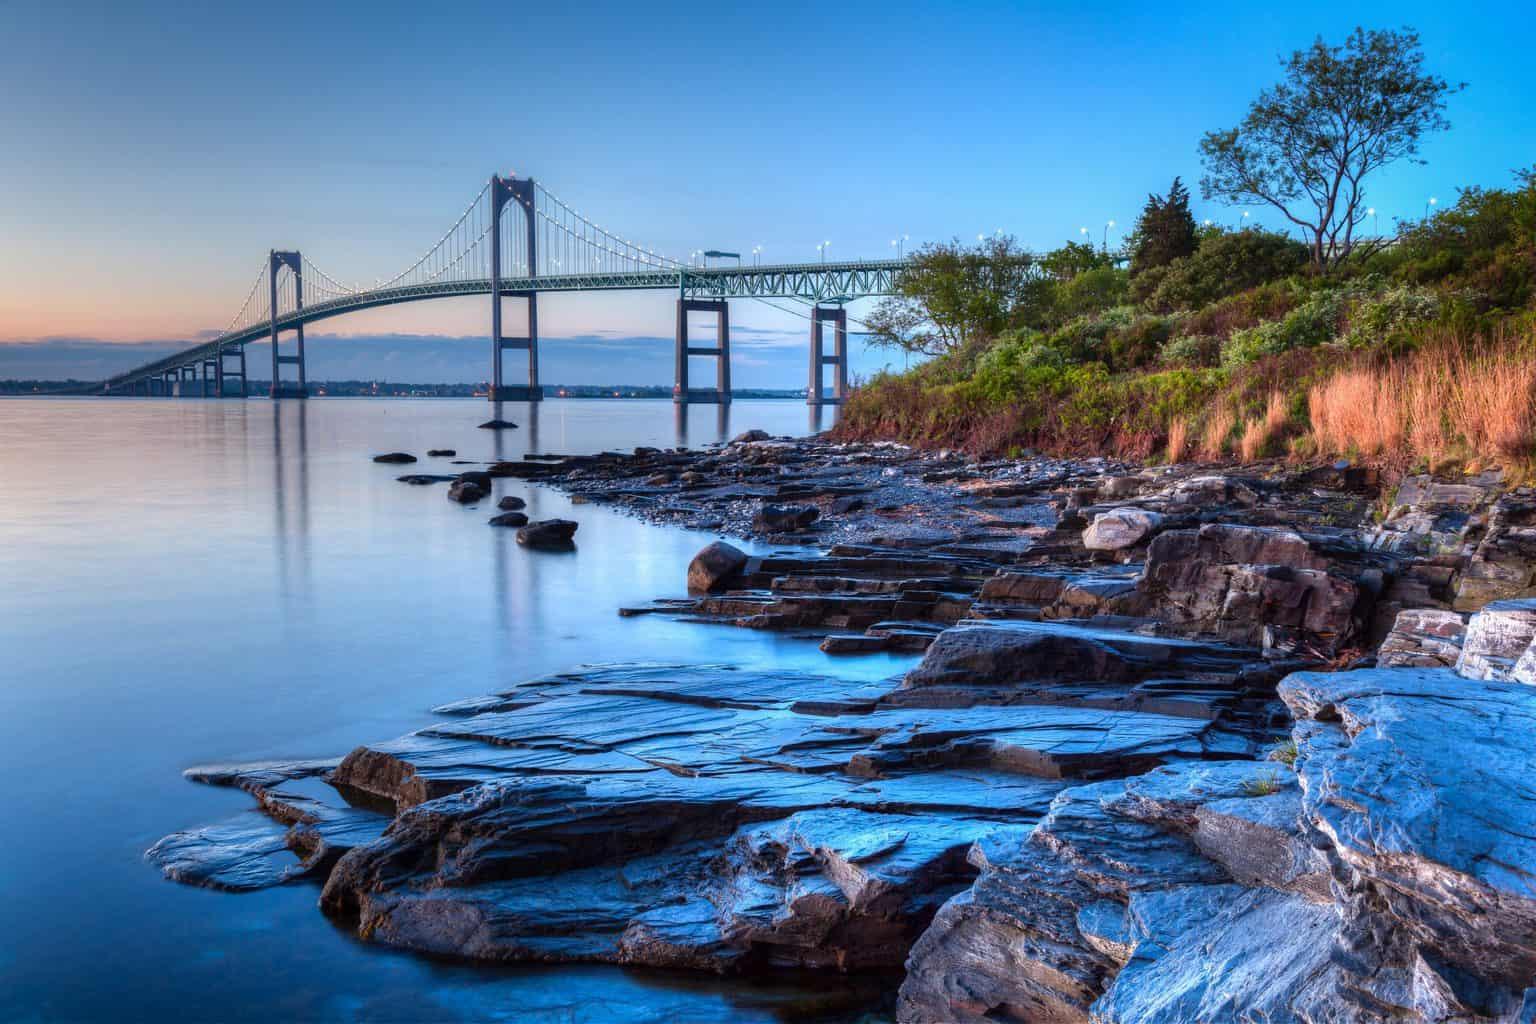 The illuminated Newport bridge from Taylor's Point near Newport, Rhode Island.